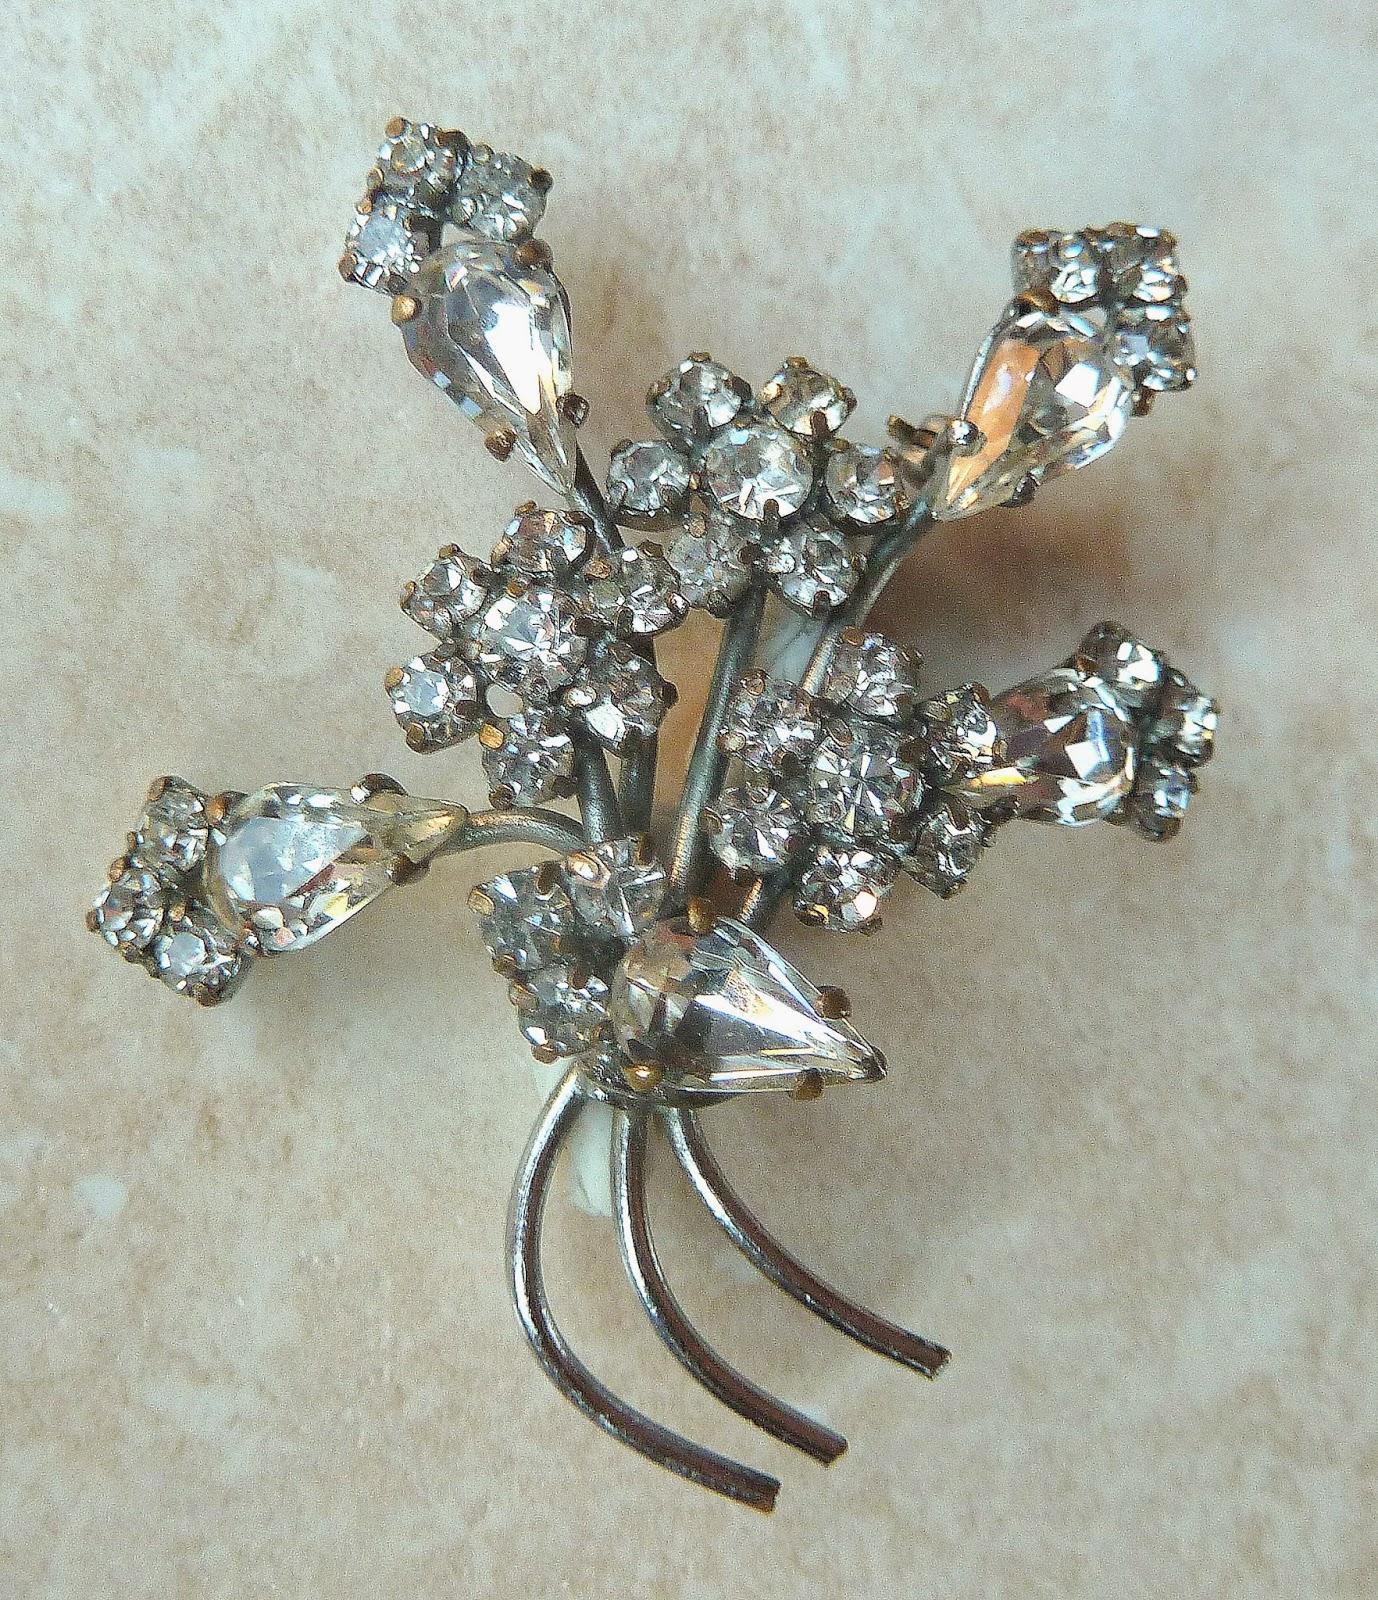 http://www.kcavintagegems.uk/vintage-clear-rhinestone-floral-spray-brooch-337-p.asp